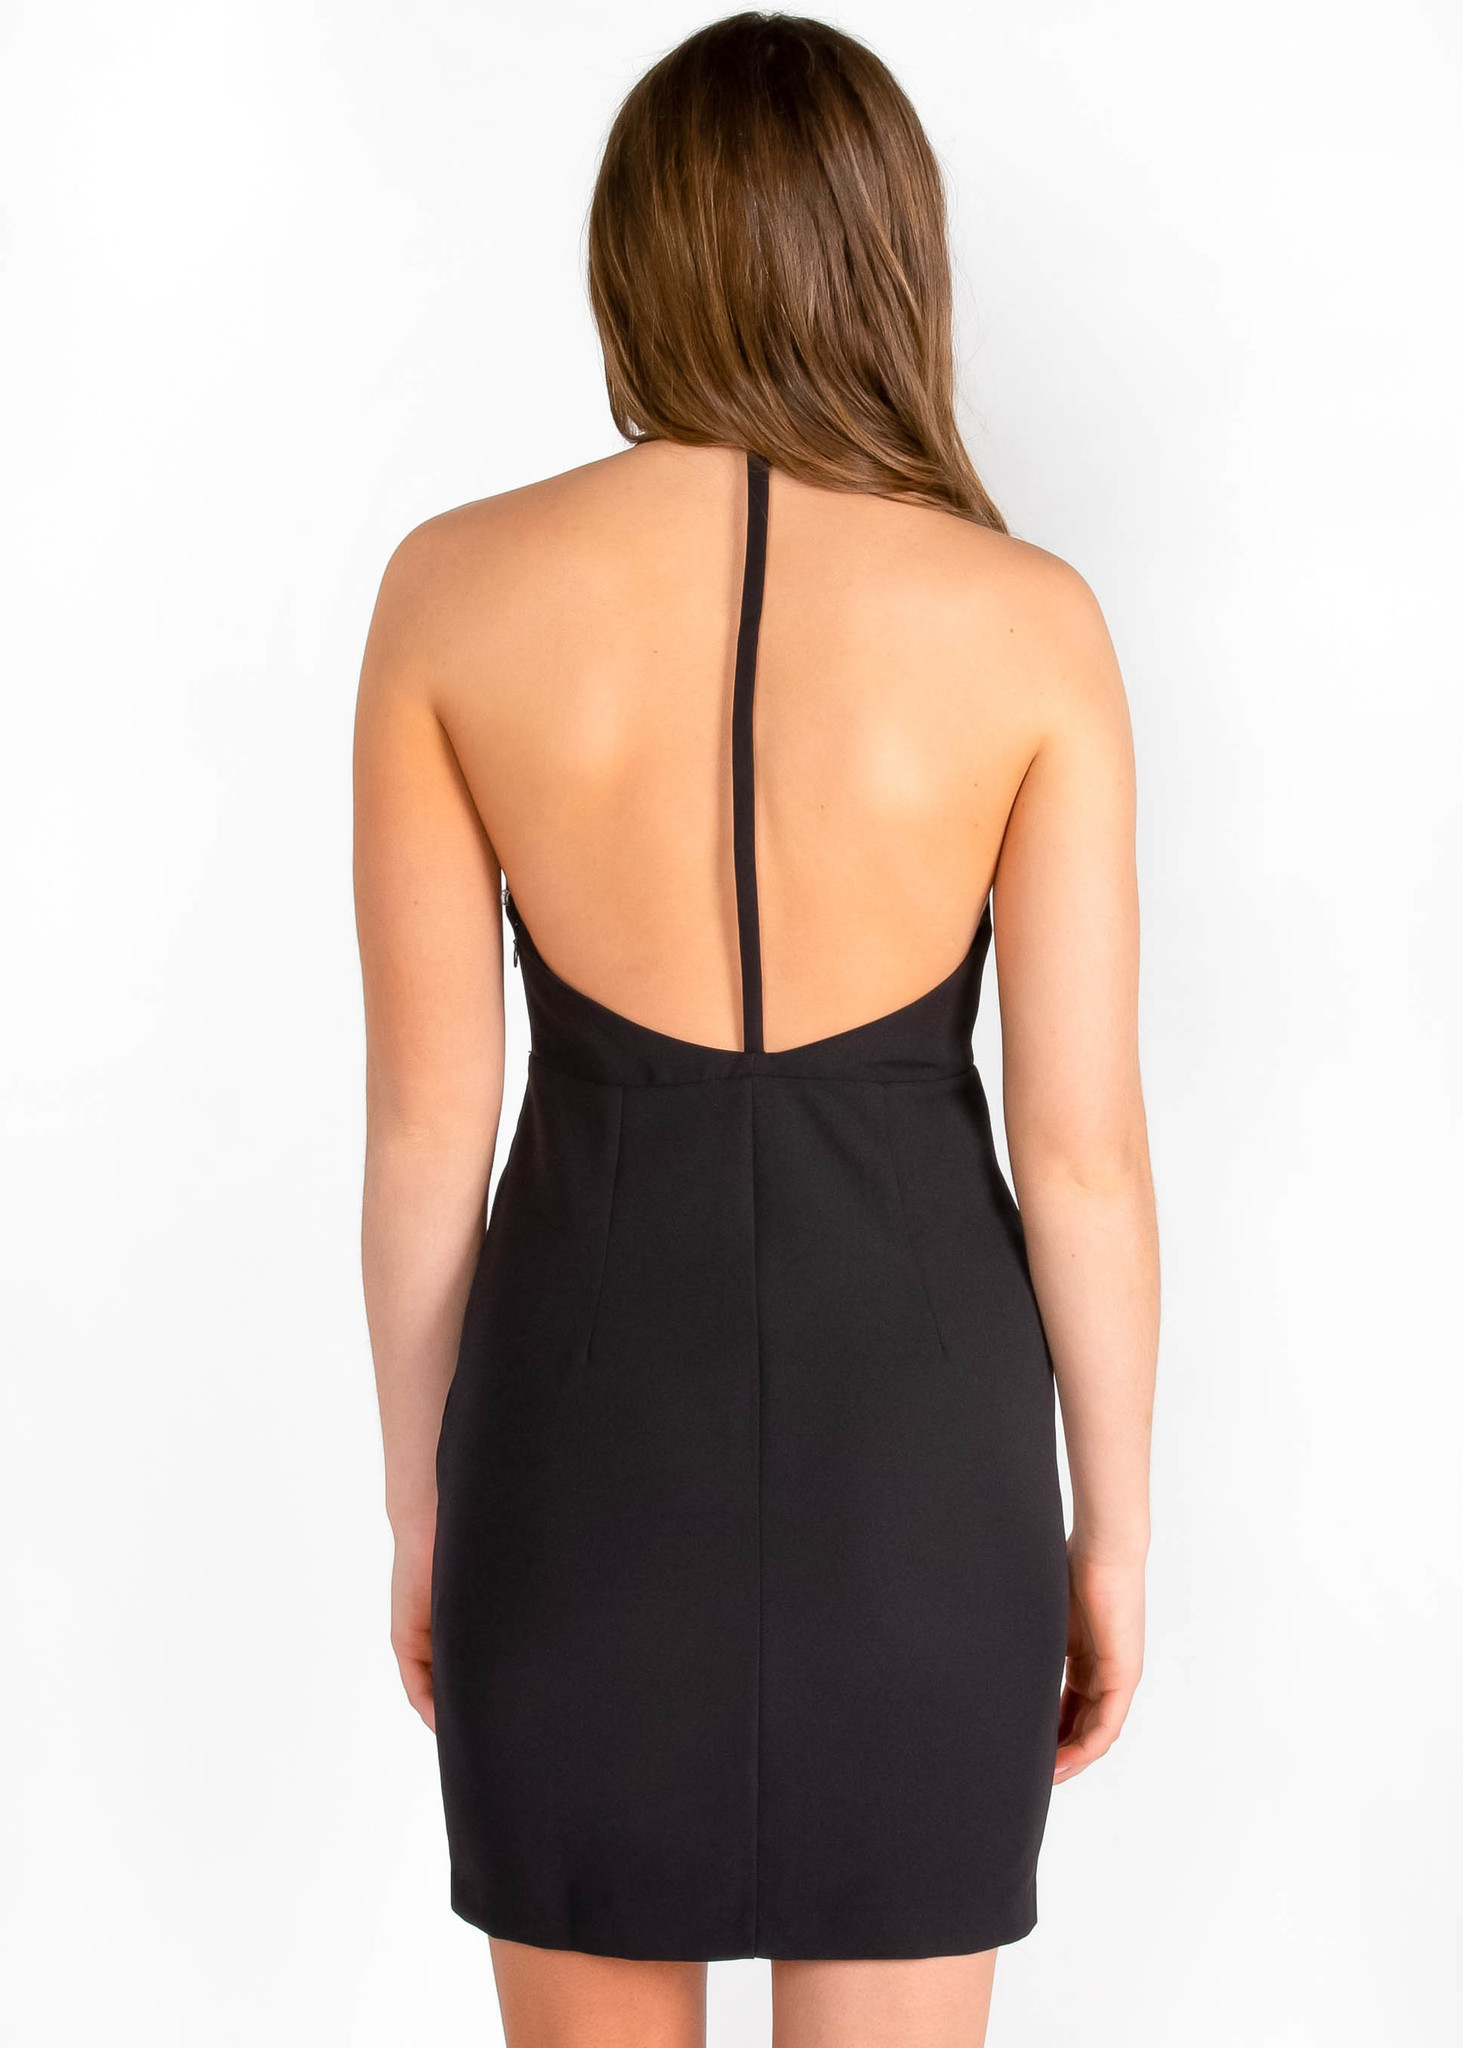 PORTIA BLACK OPEN BACK DRESS